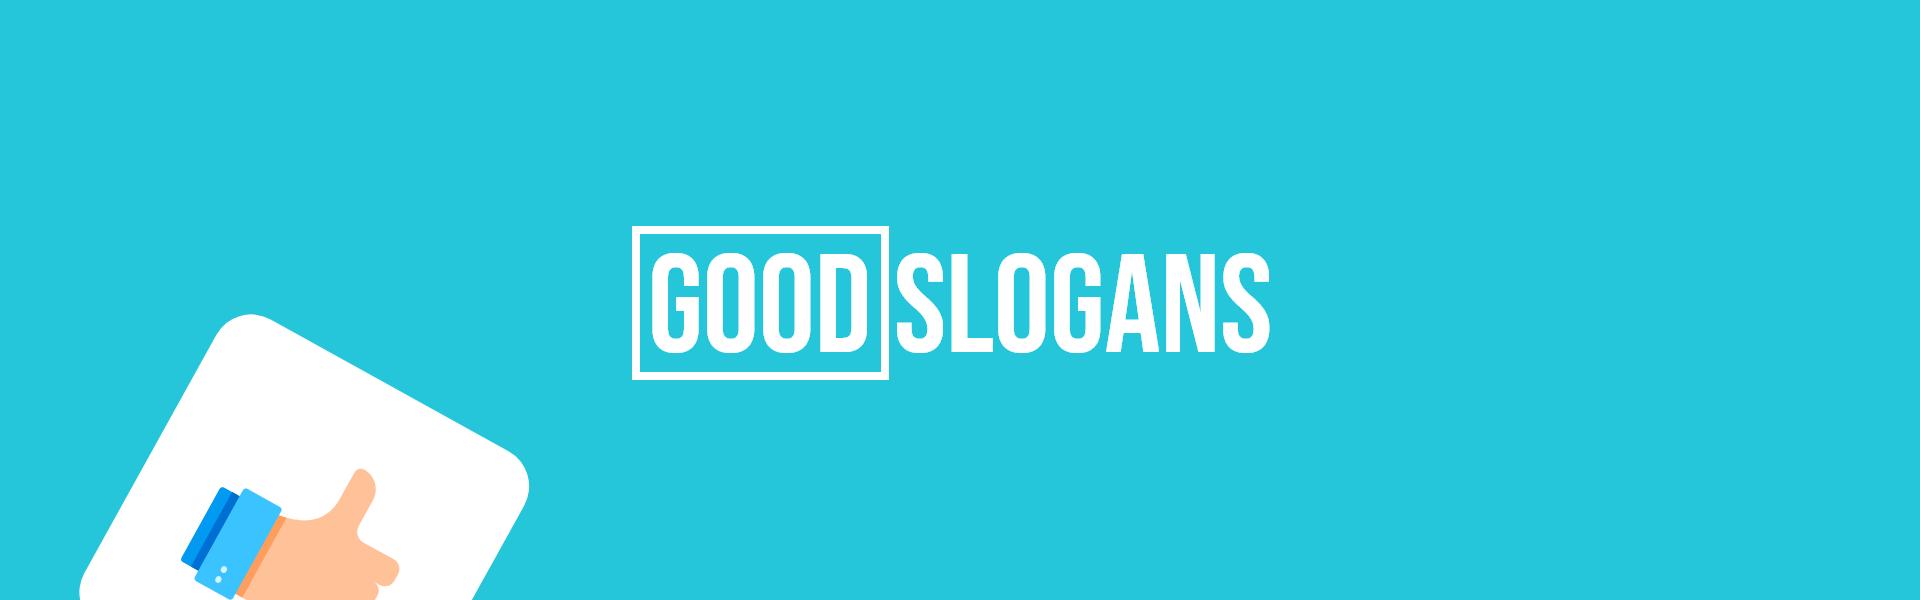 good slogans taglines